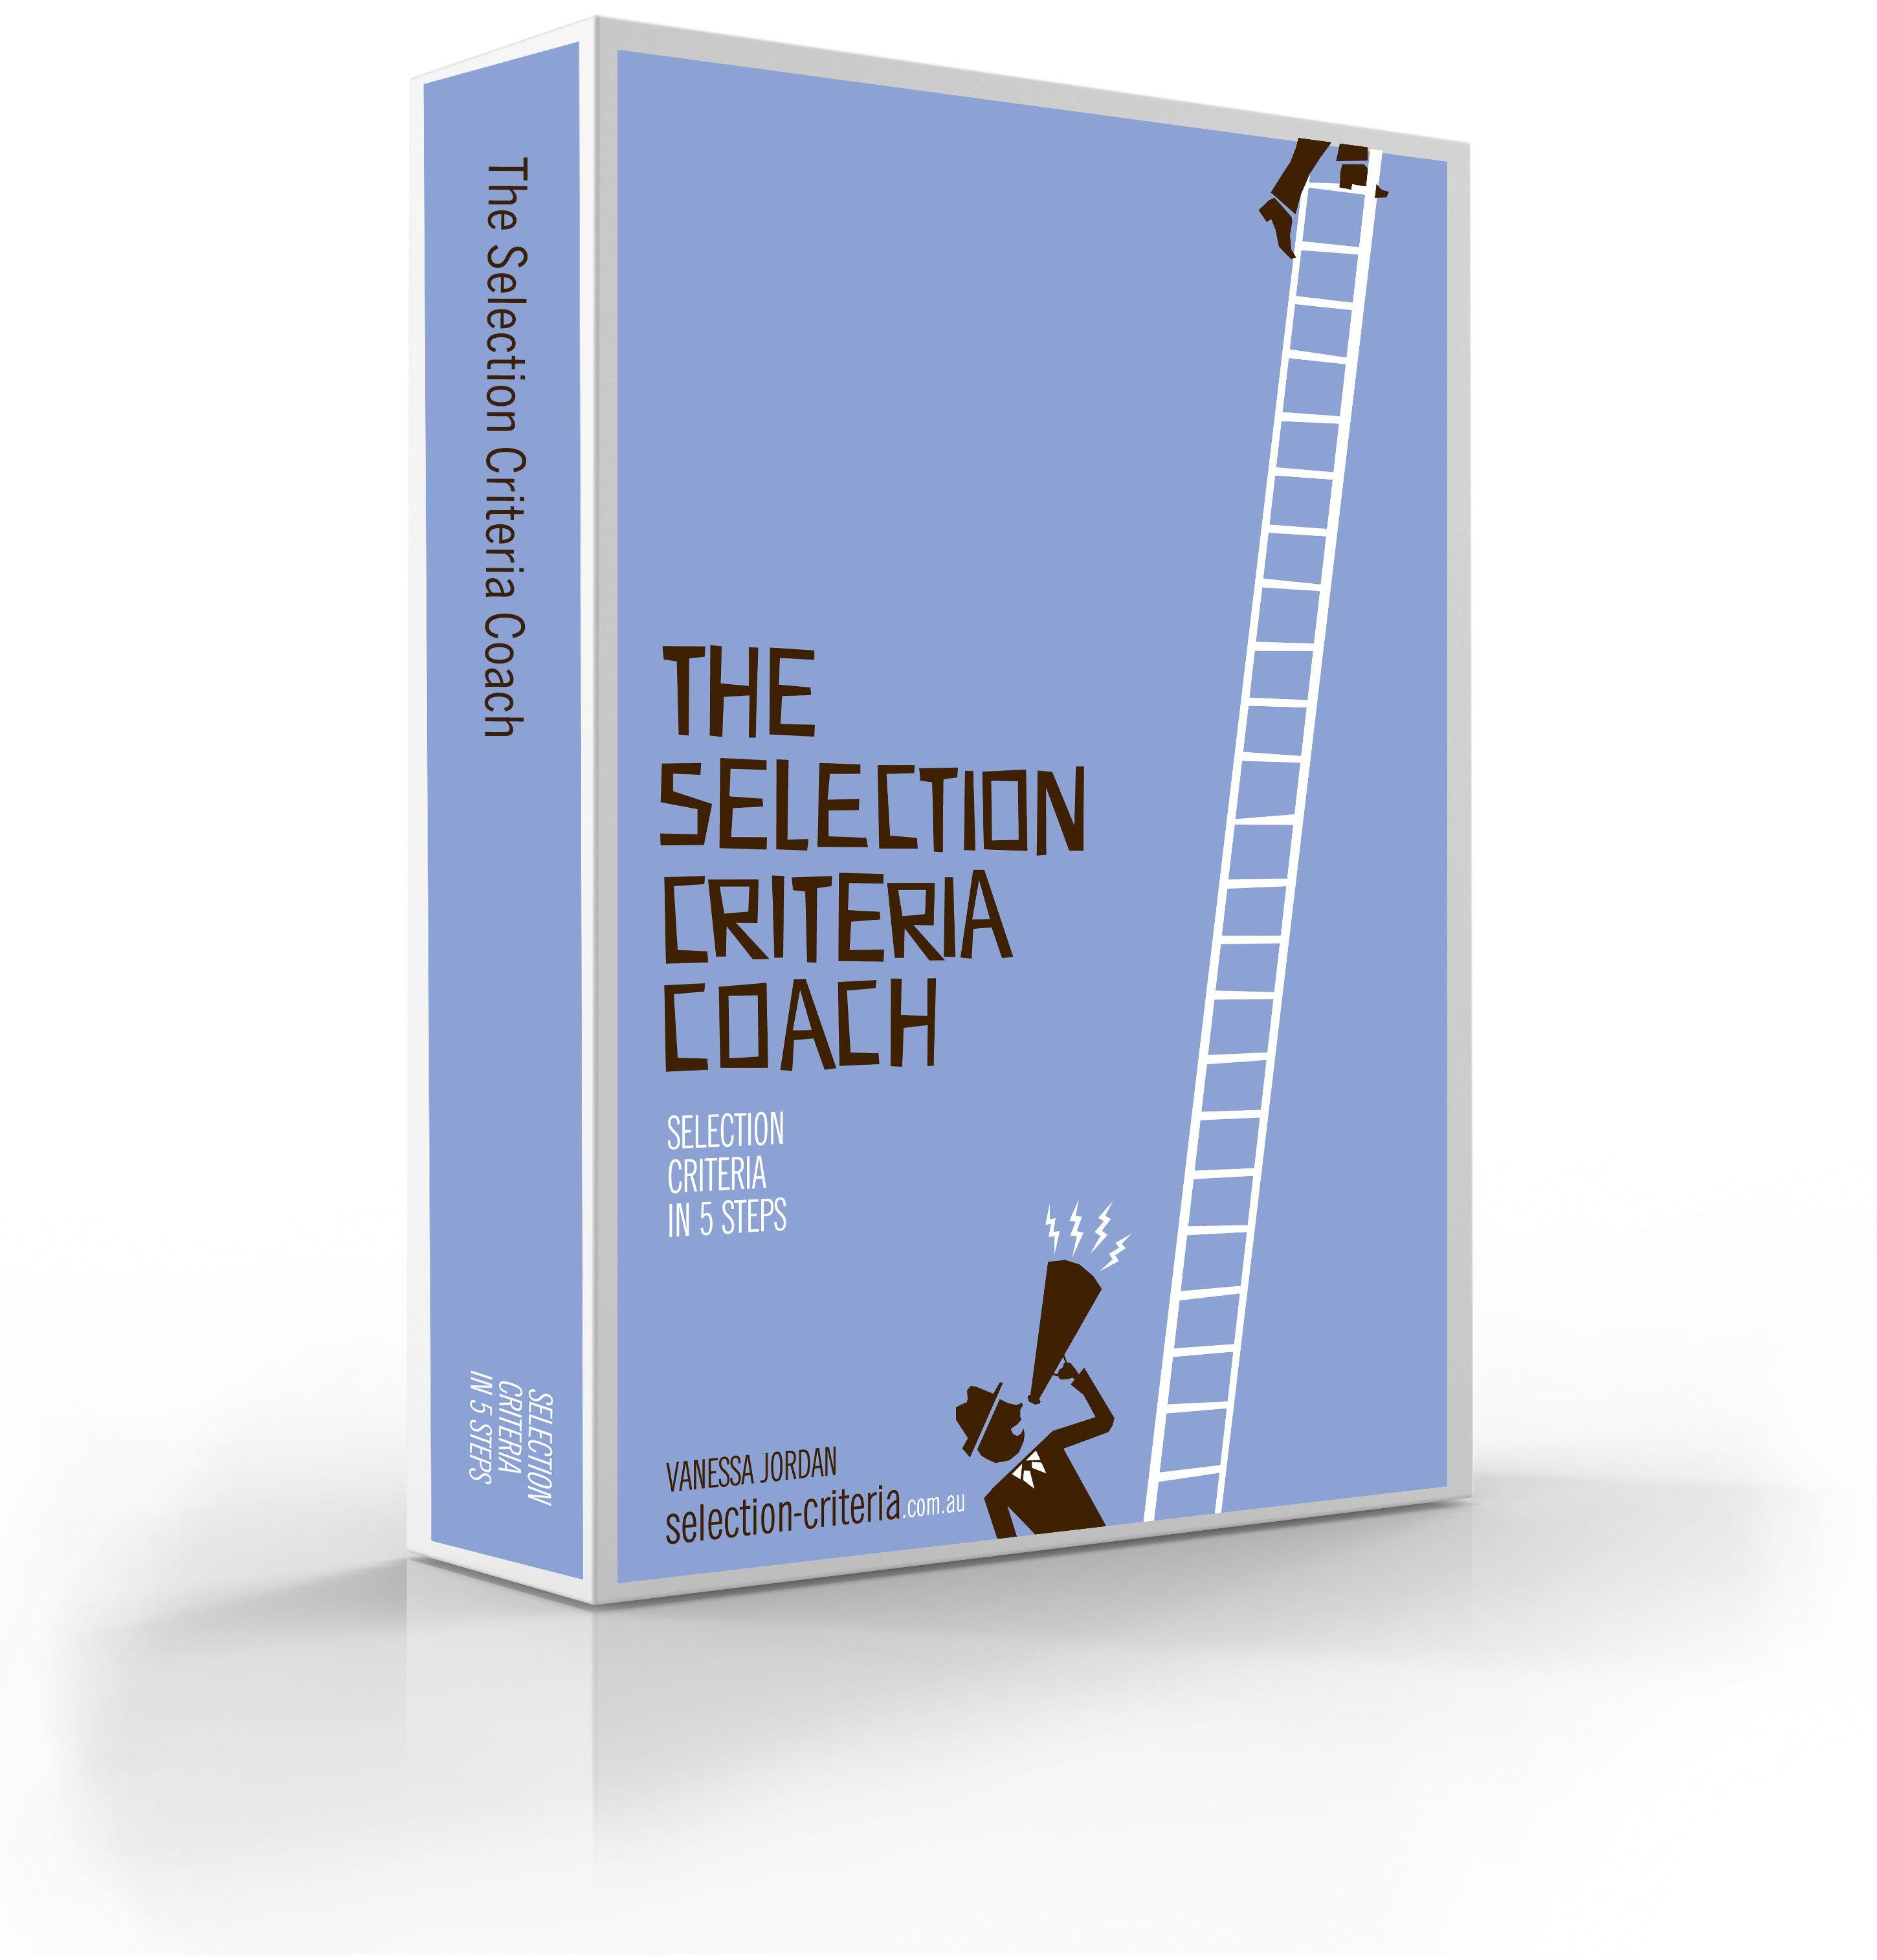 Selection Criteria Cover Letter: The Selection Criteria Coach